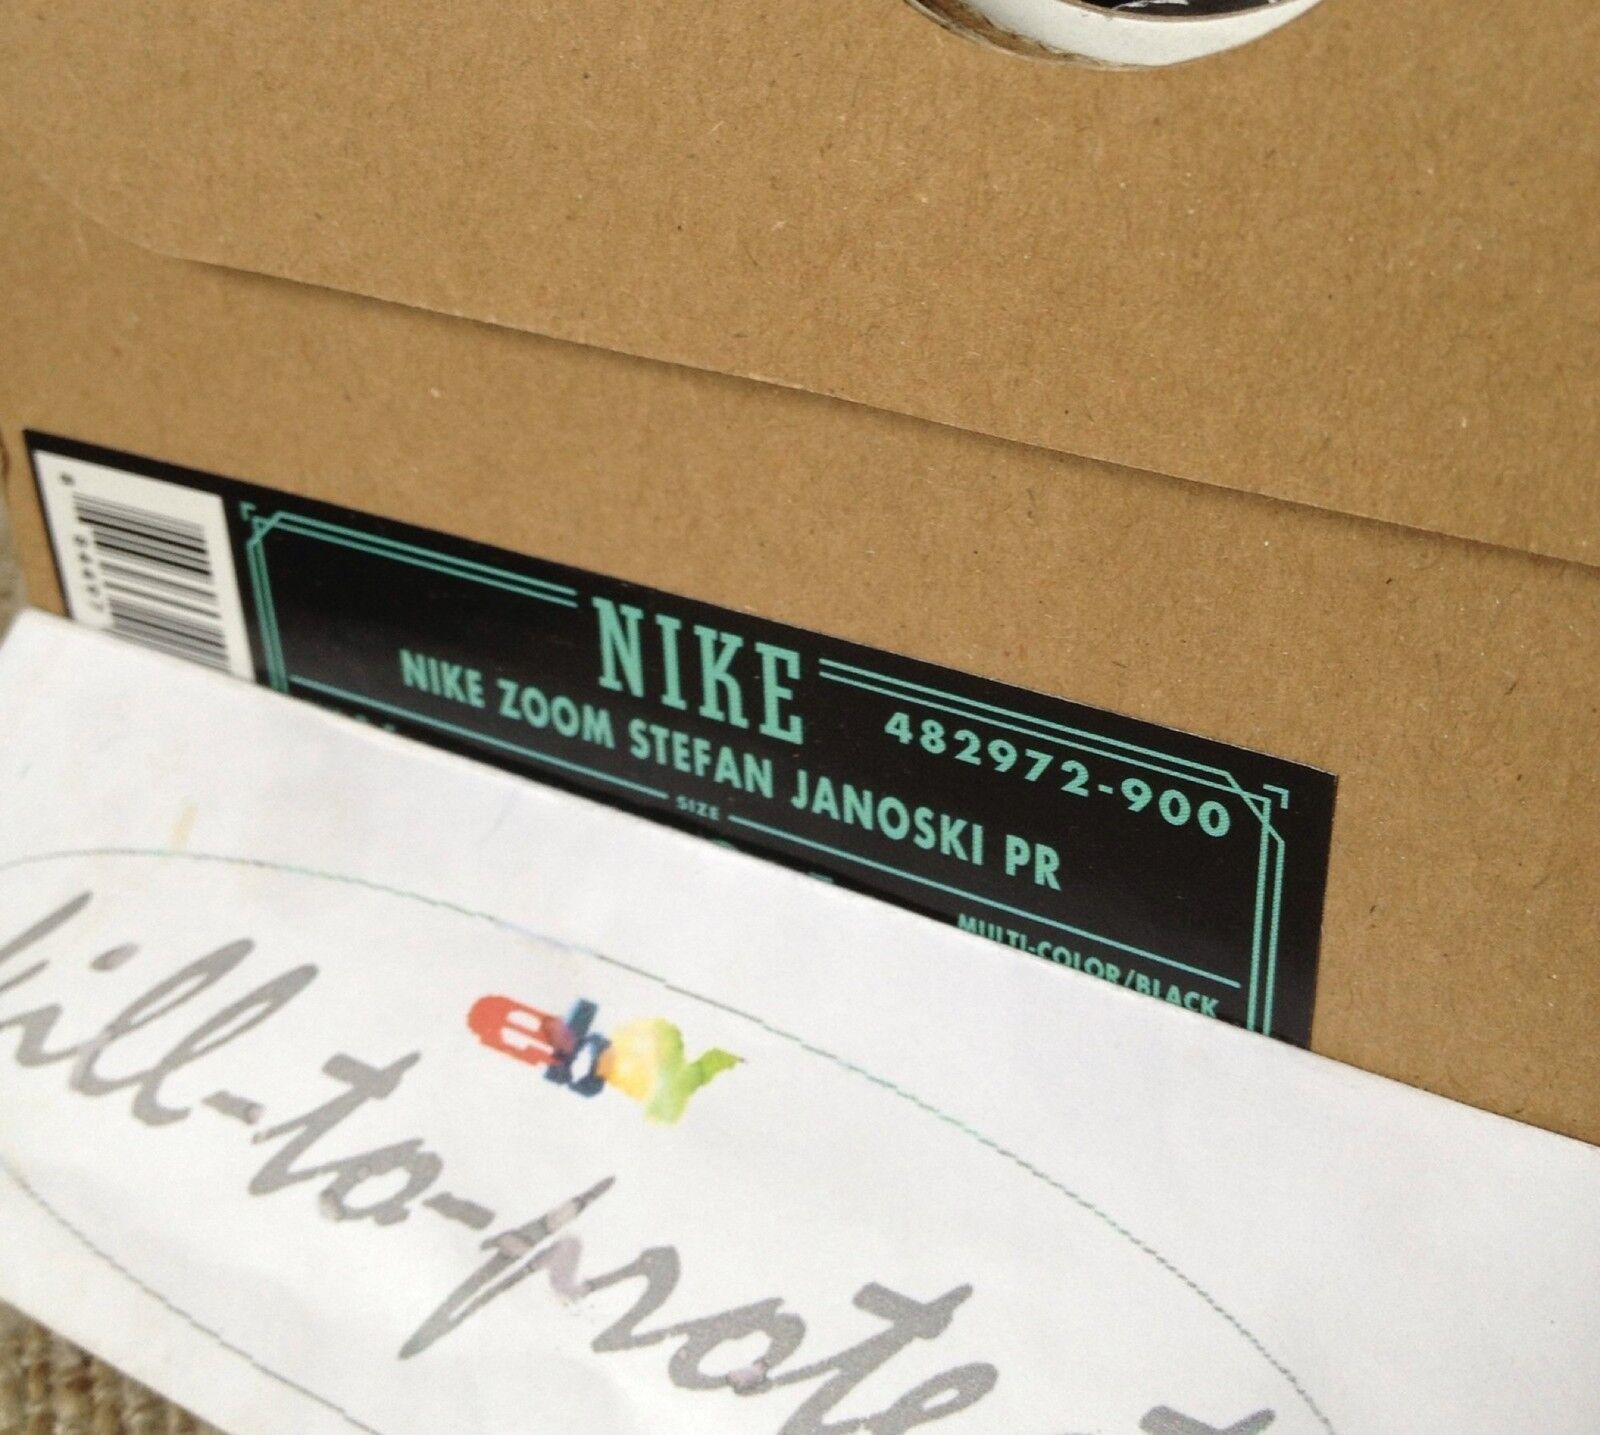 Nike sb stefan janoski floral sz uns uk4 5 5 uk4 6 7 8 9 10 11 digi camo 482972-900 1163f7